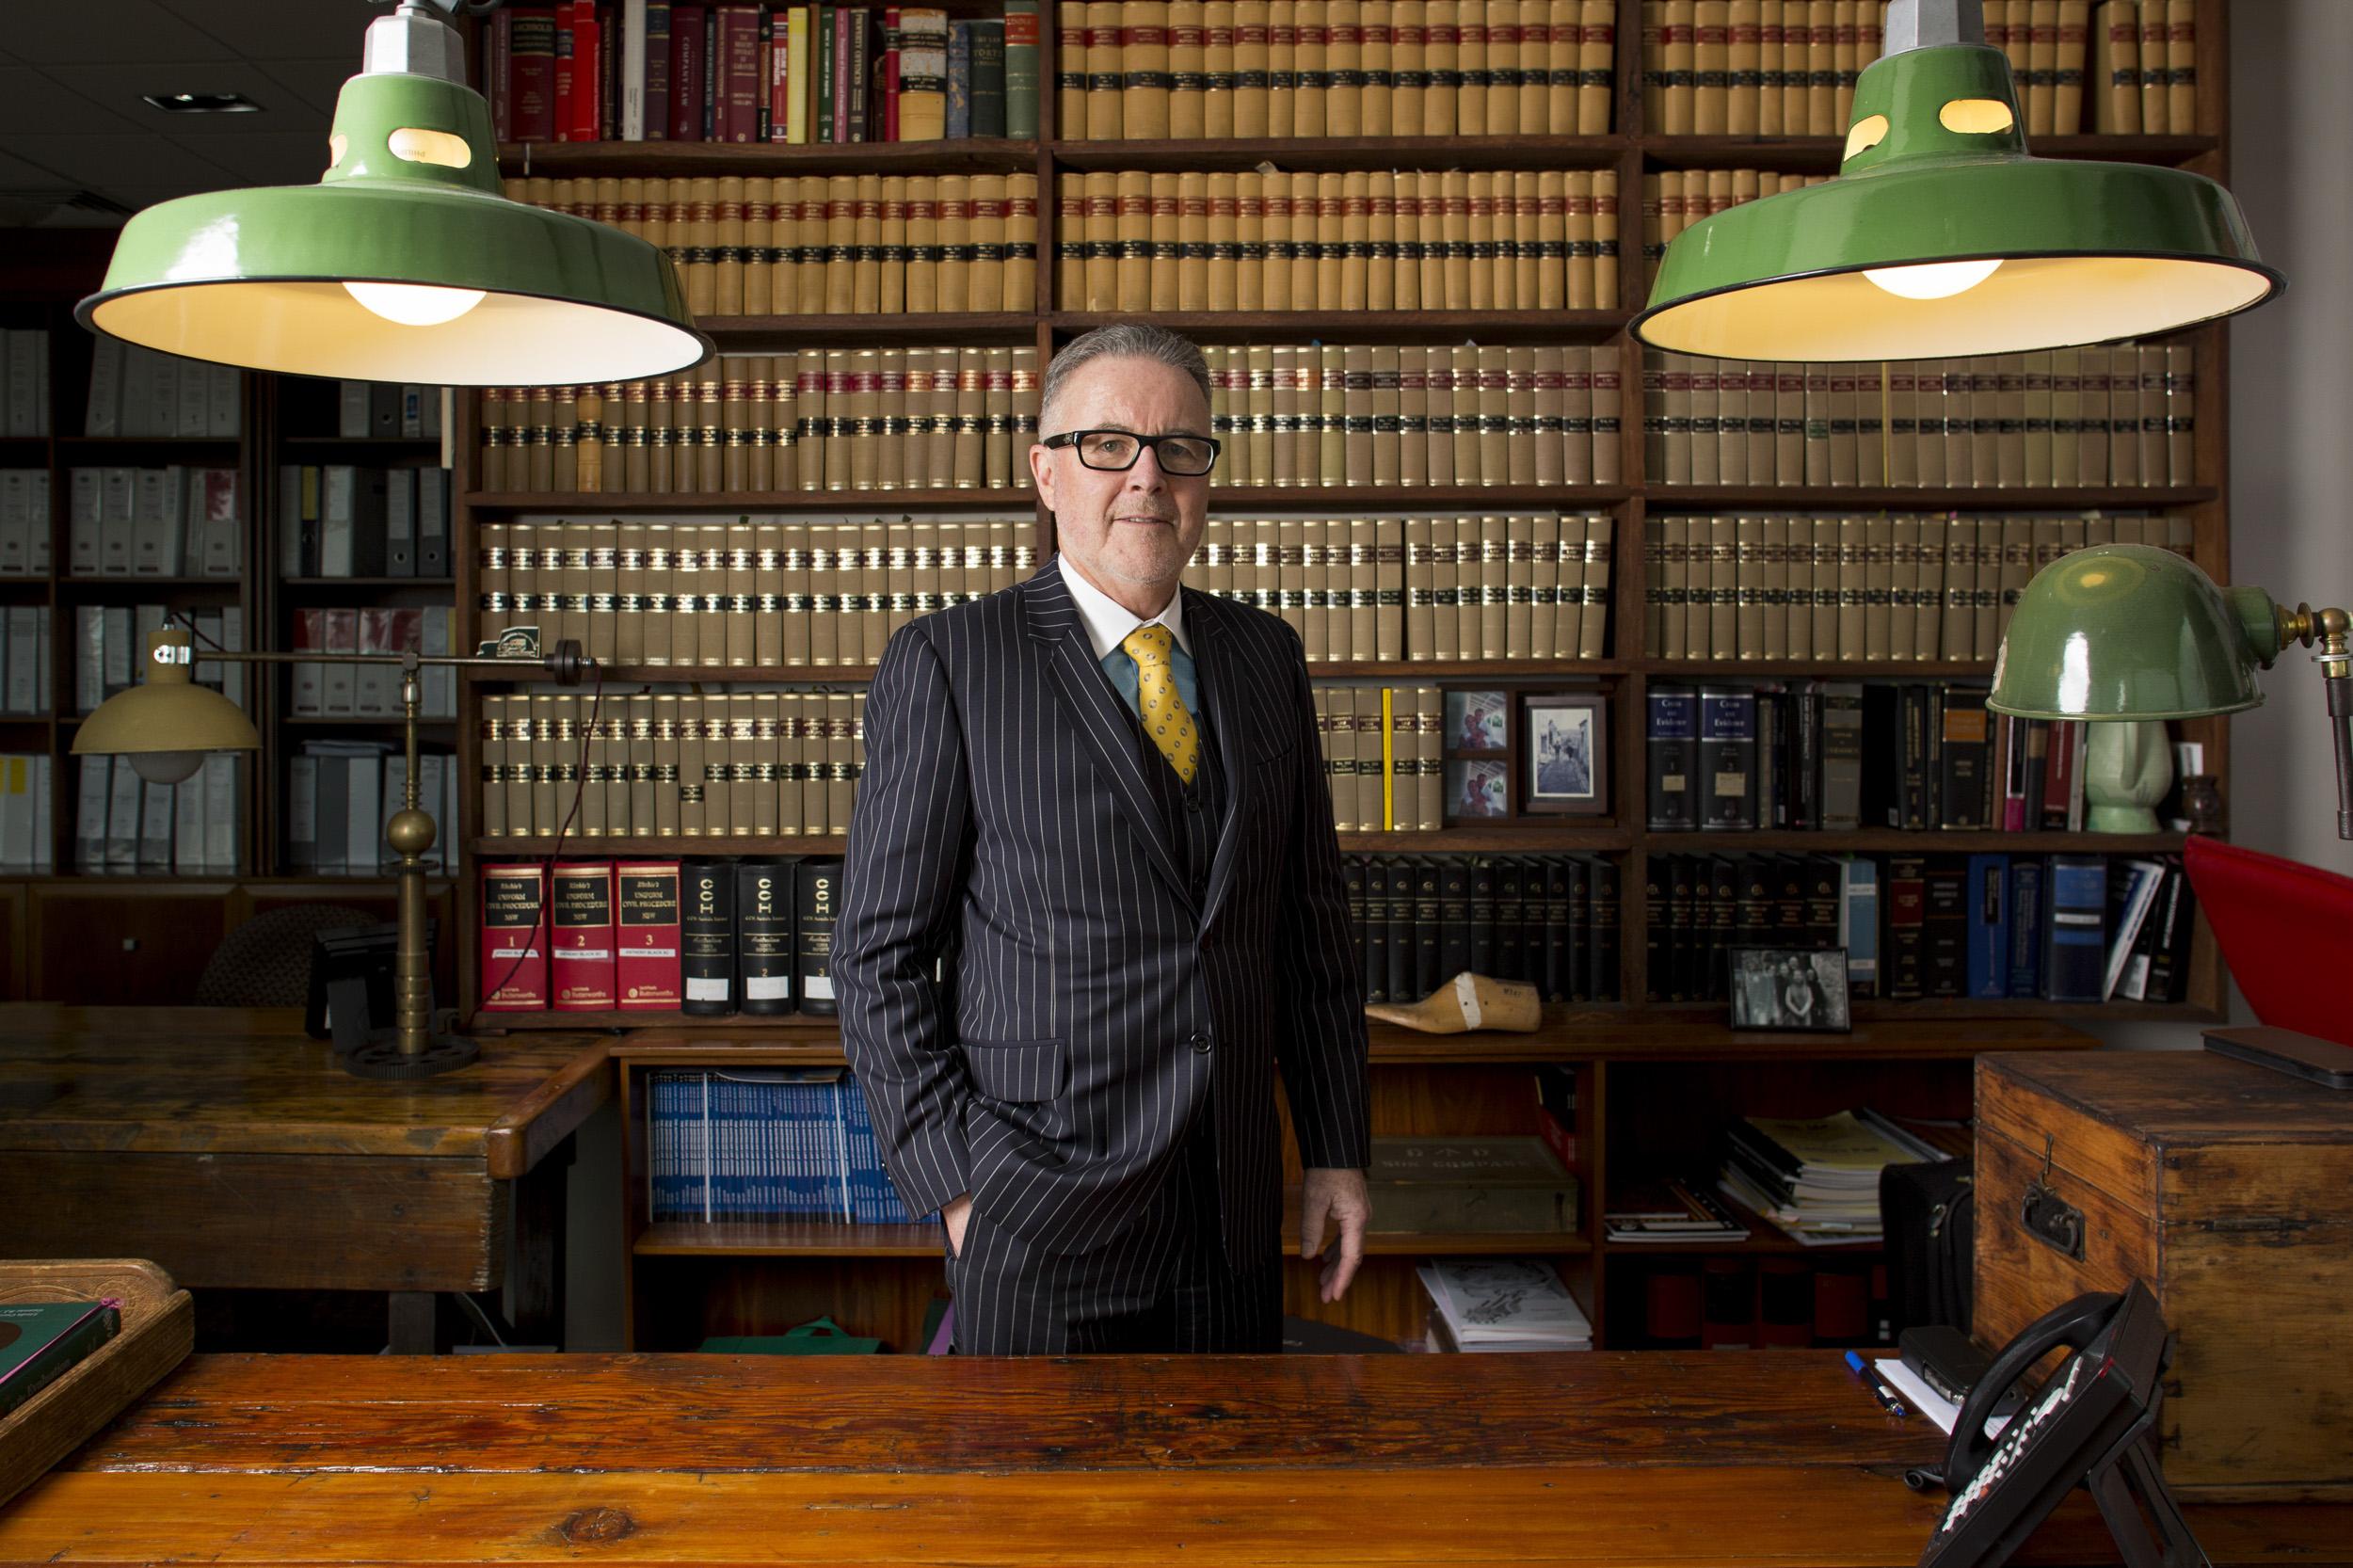 barrister-portrait-Sydney-Australia_07.jpg